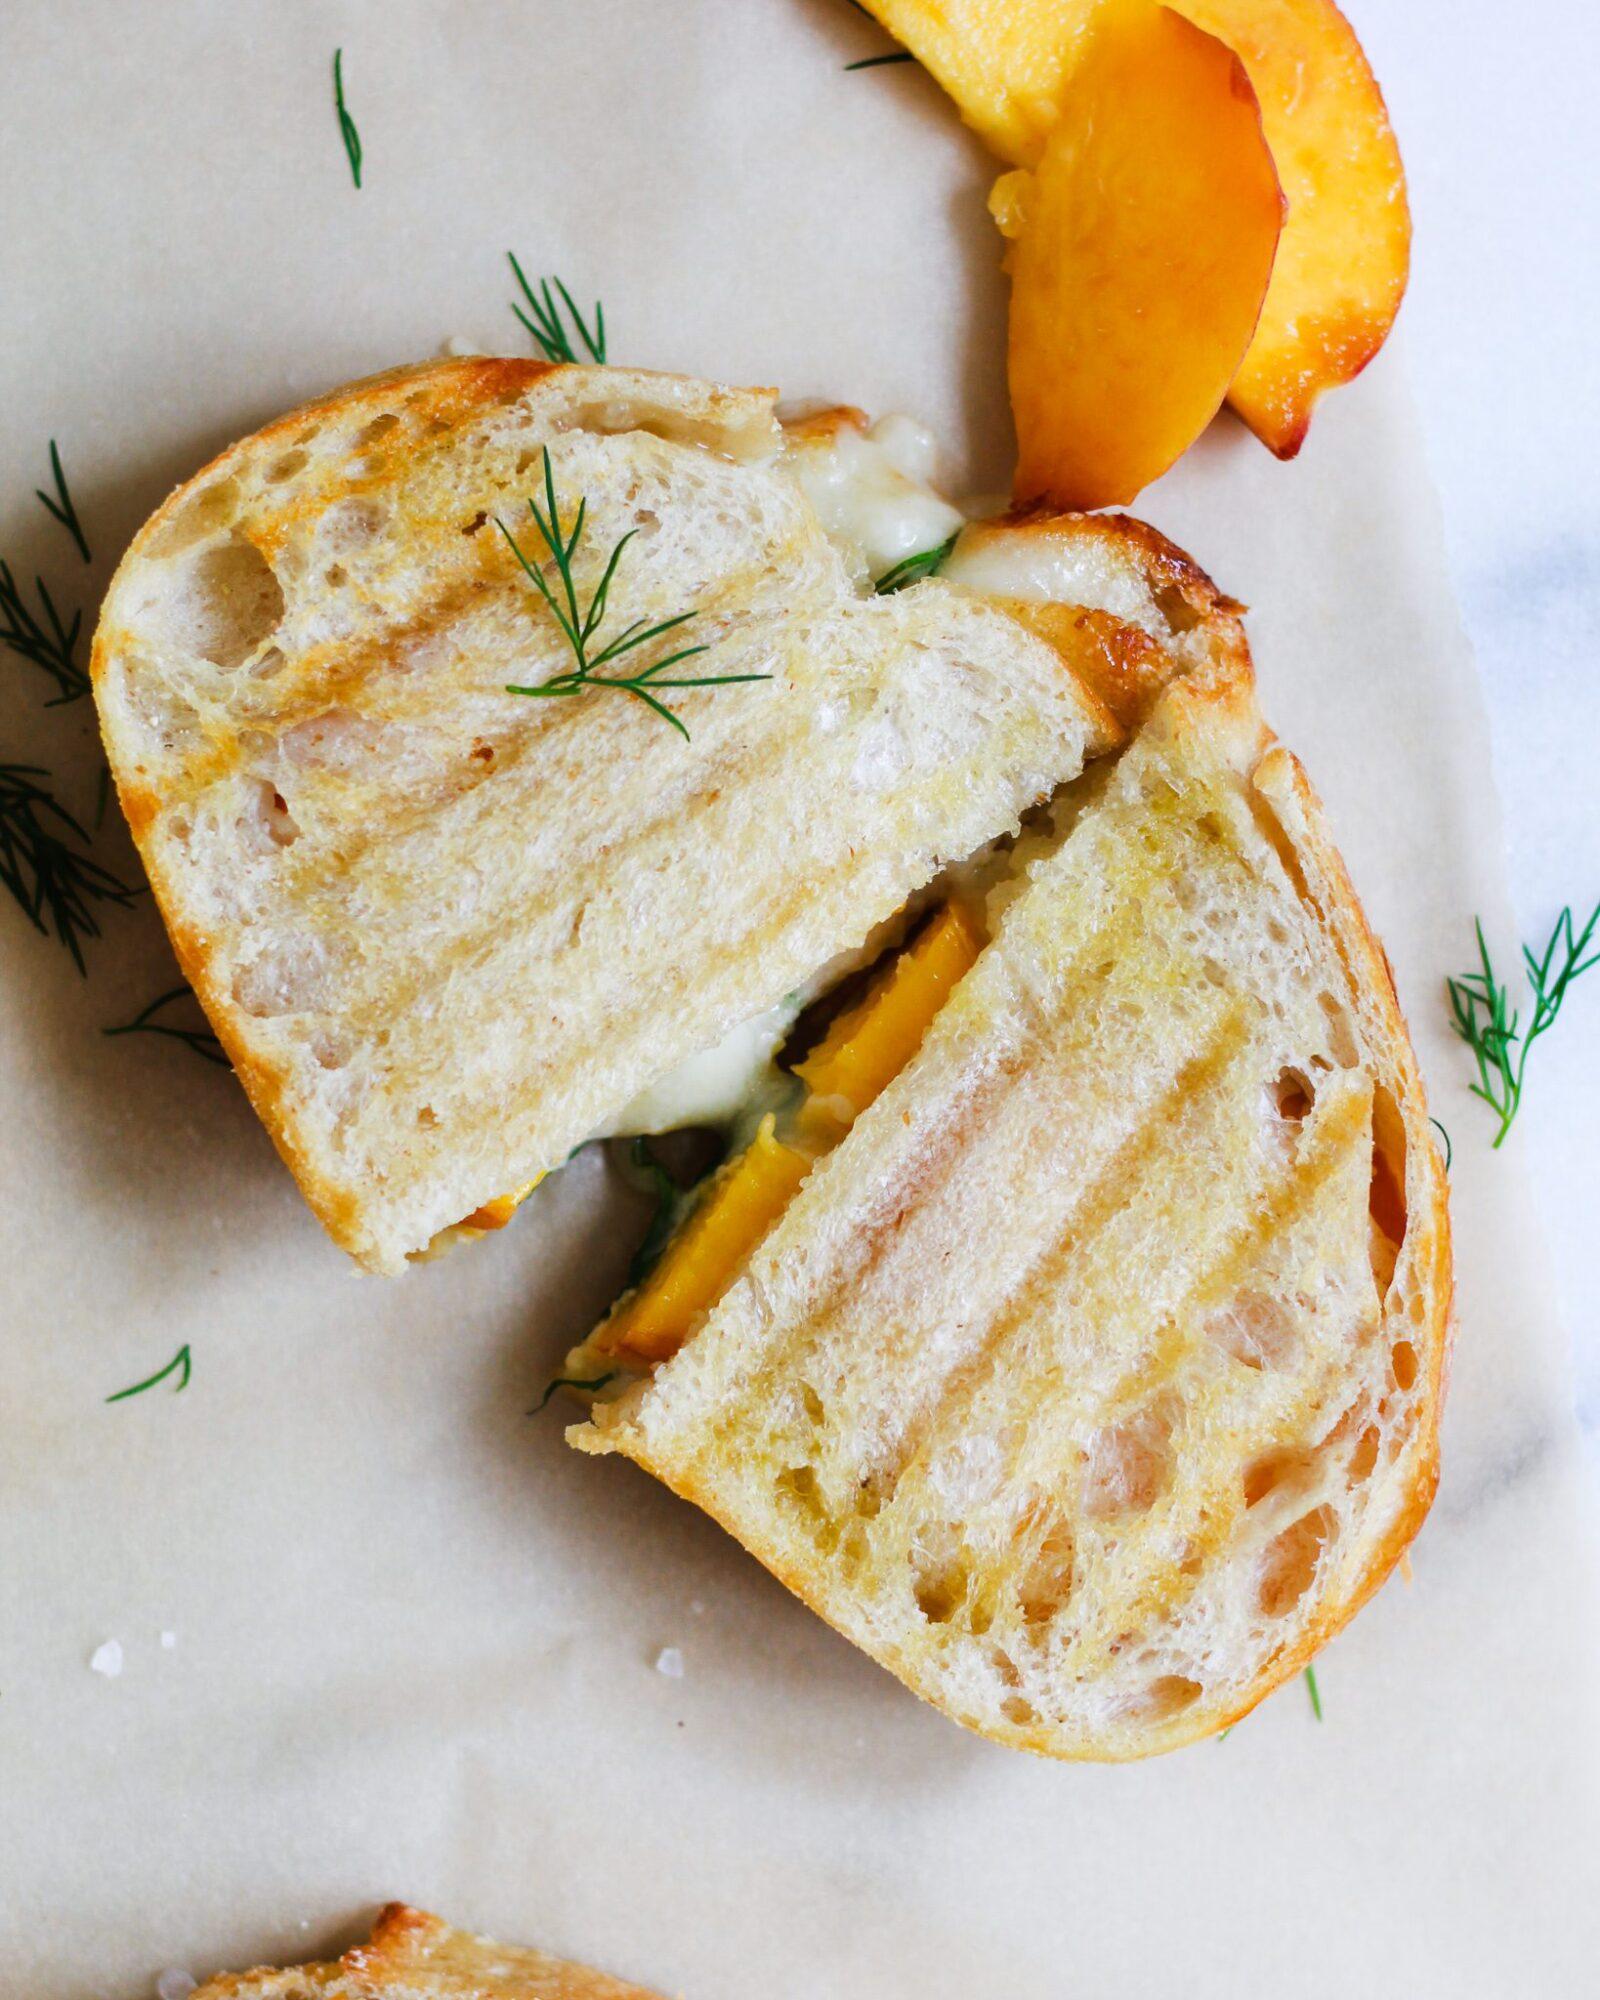 sliced brie peach grilled cheese sandwich